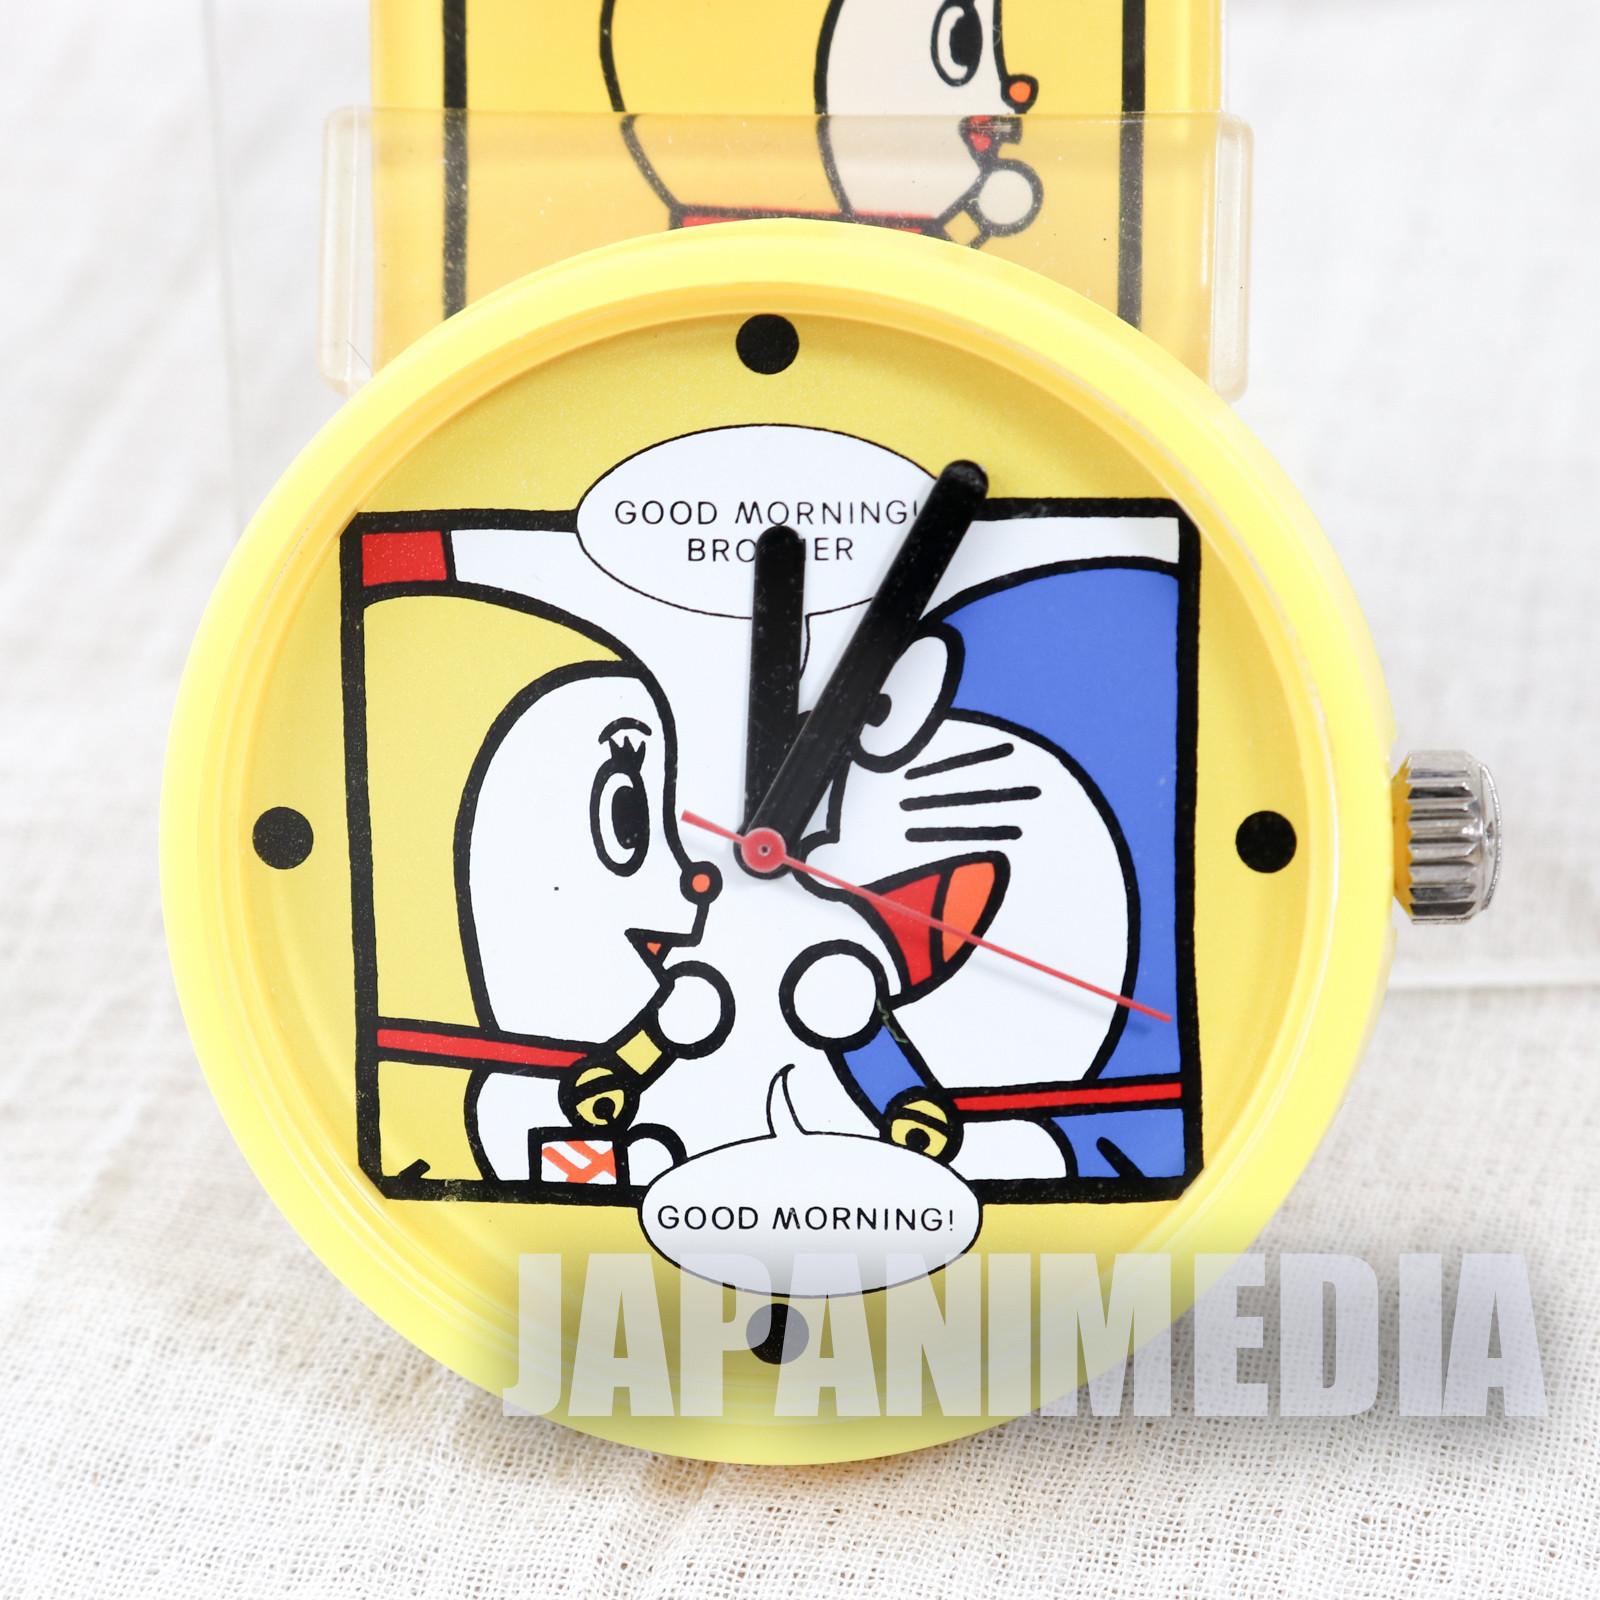 Doraemon Wrist Watch DRATCH Dorami Yellow ver. JAPAN ANIME FUJIKO FUJIO